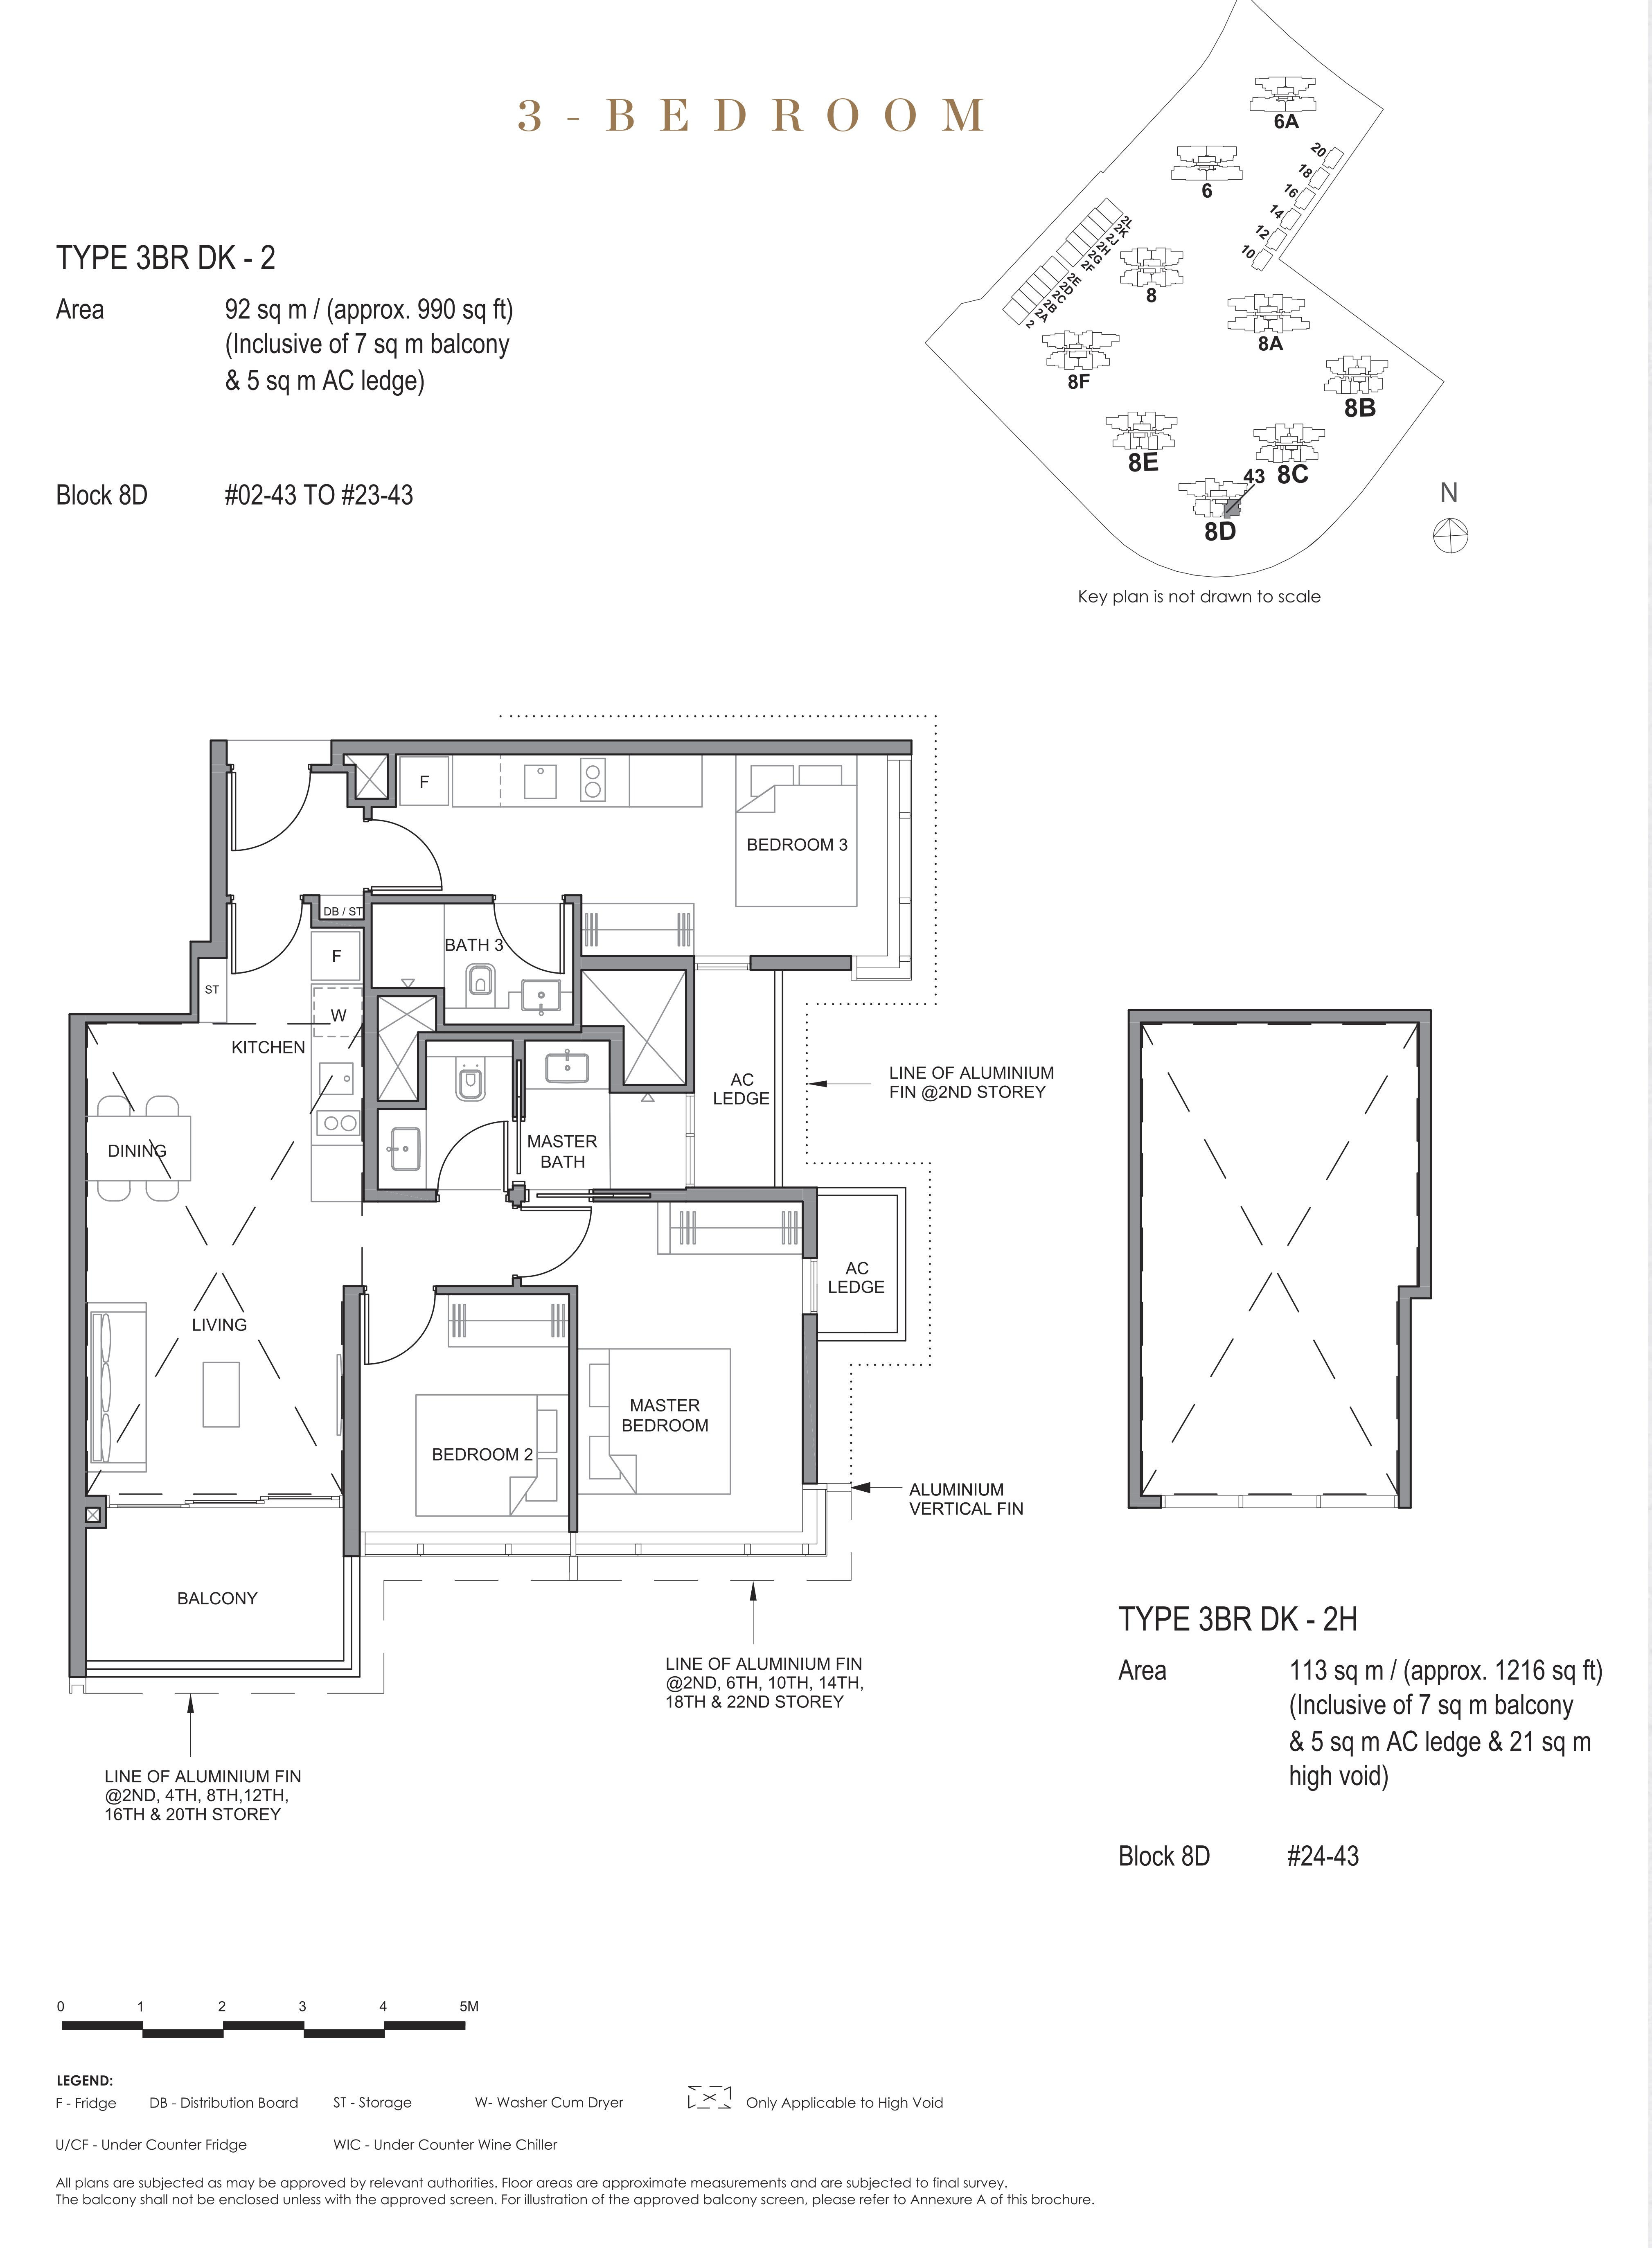 Parc Clematis 锦泰门第 contemporary 3 bedroom dk 3卧房-双钥匙 3BR-dk2